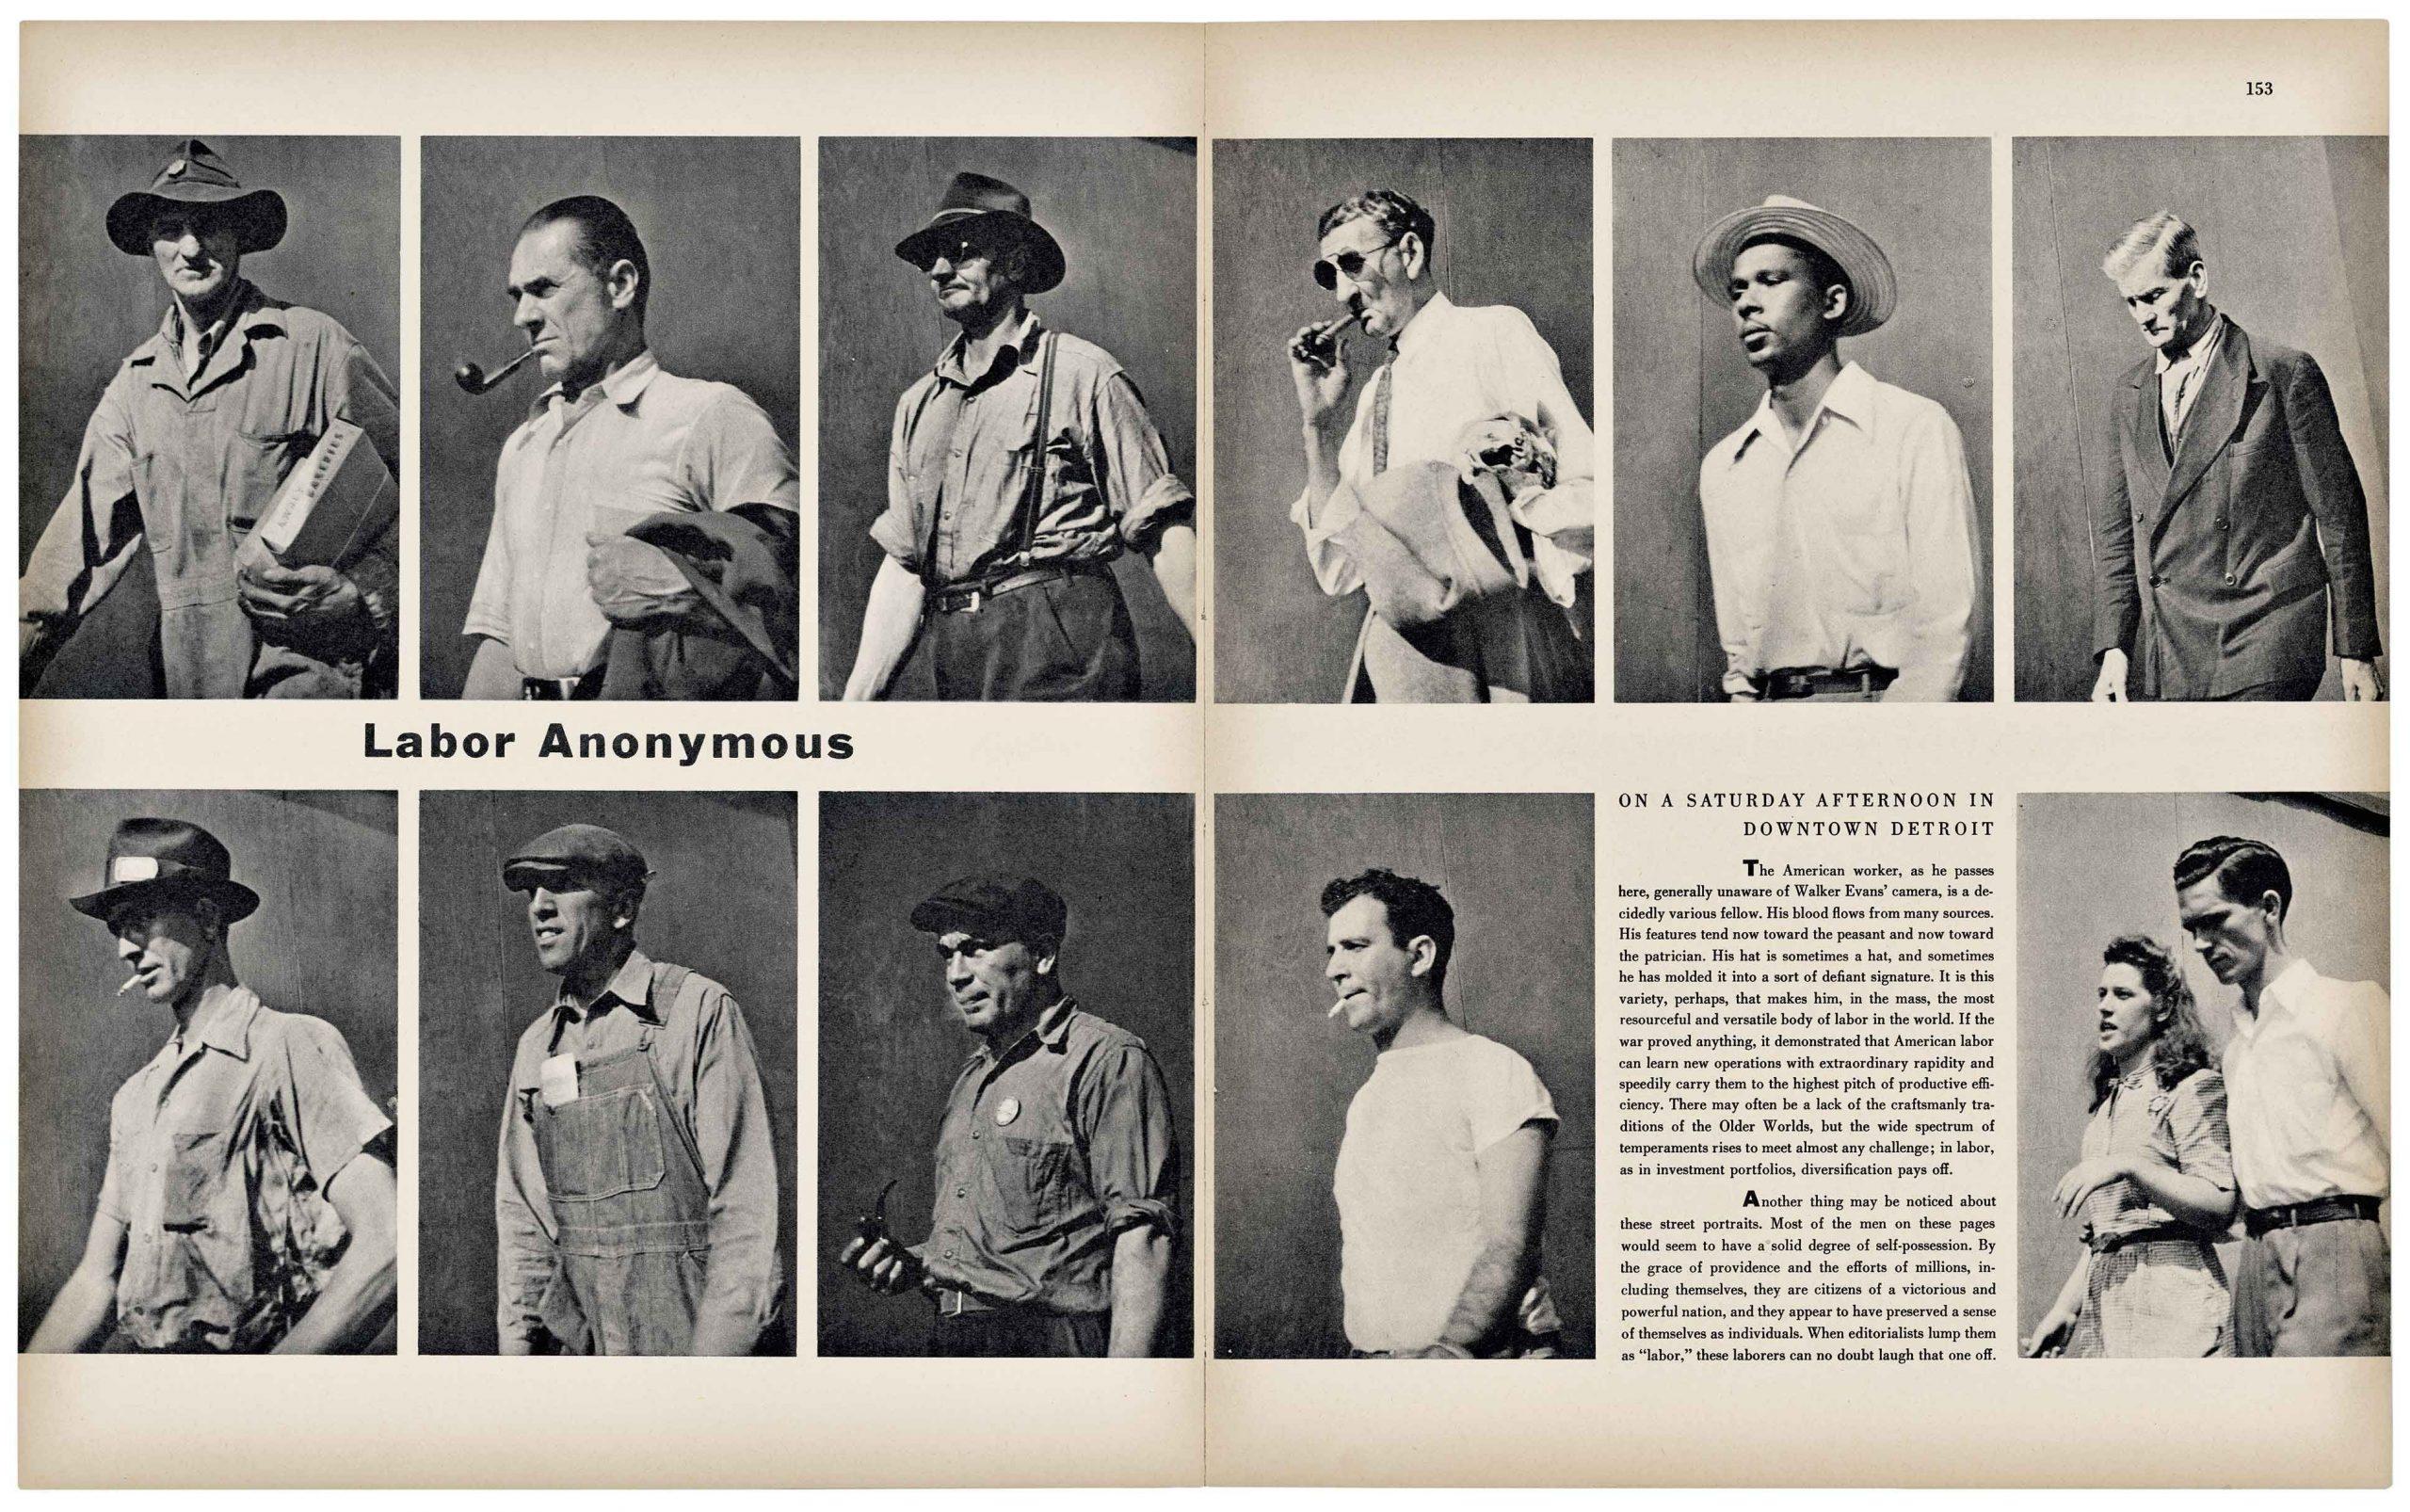 Walker Evans, Labor Anonymous, Fortune, November 1946